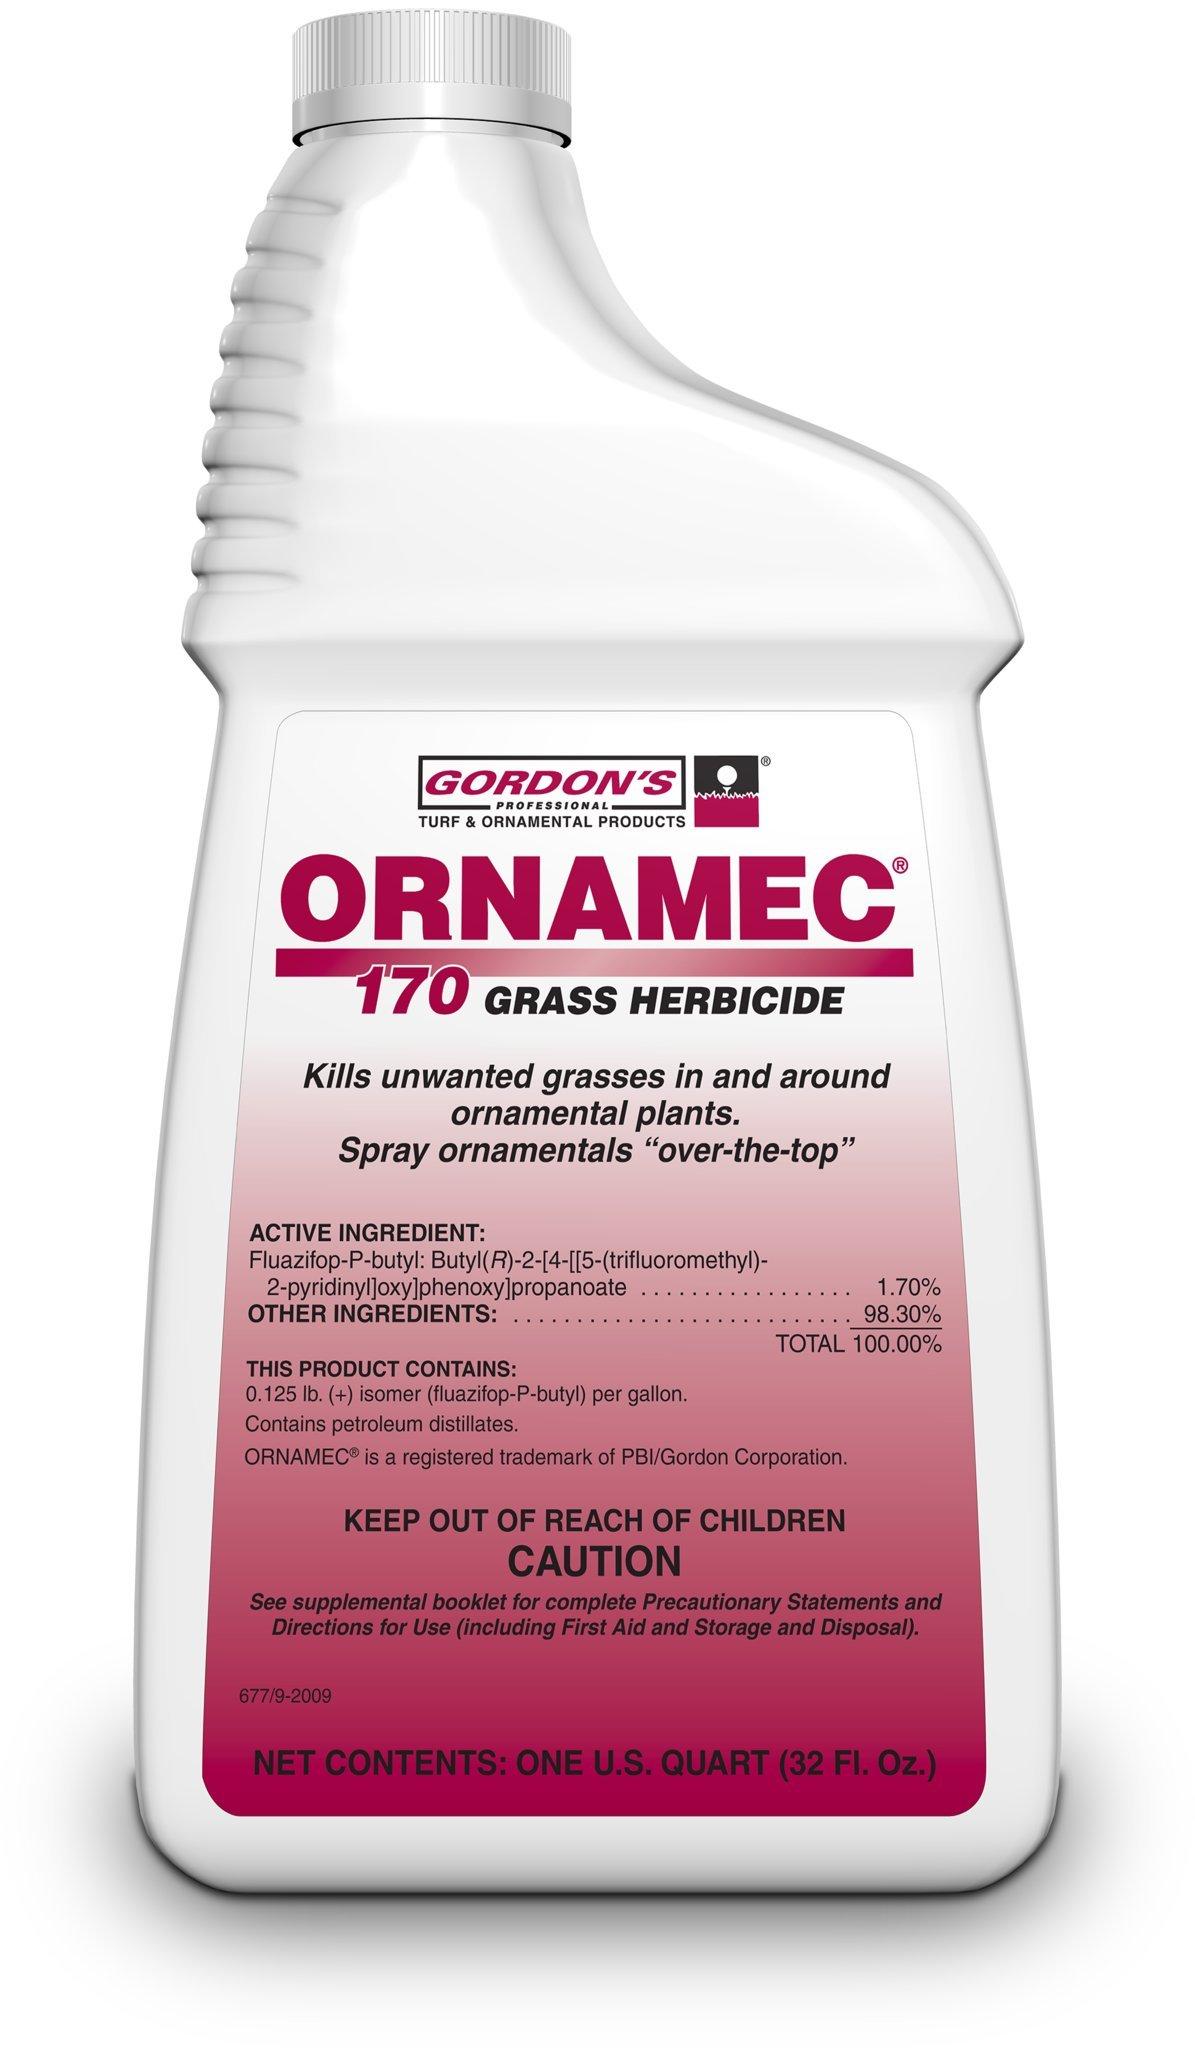 Gordon's Ornamec 170 Grass Herbicide, 32 Ounces by Gordon's